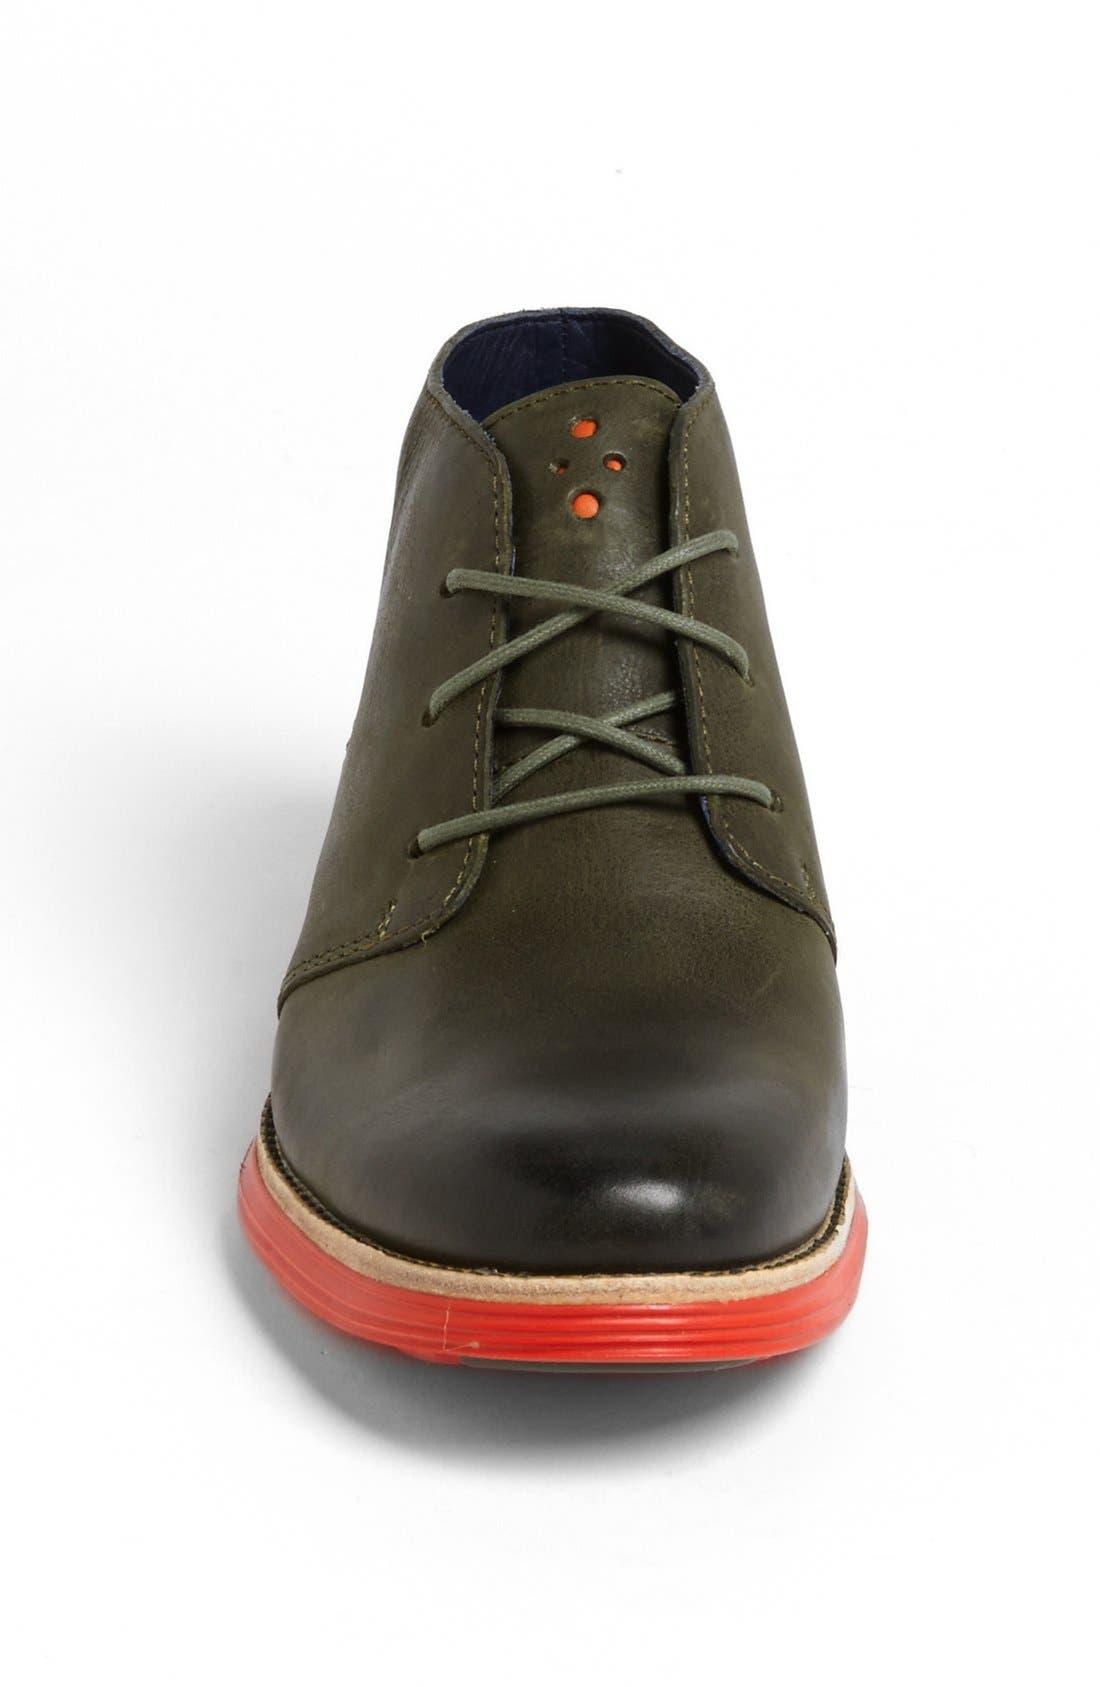 Alternate Image 3  - Cole Haan 'LunarGrand' Chukka Boot